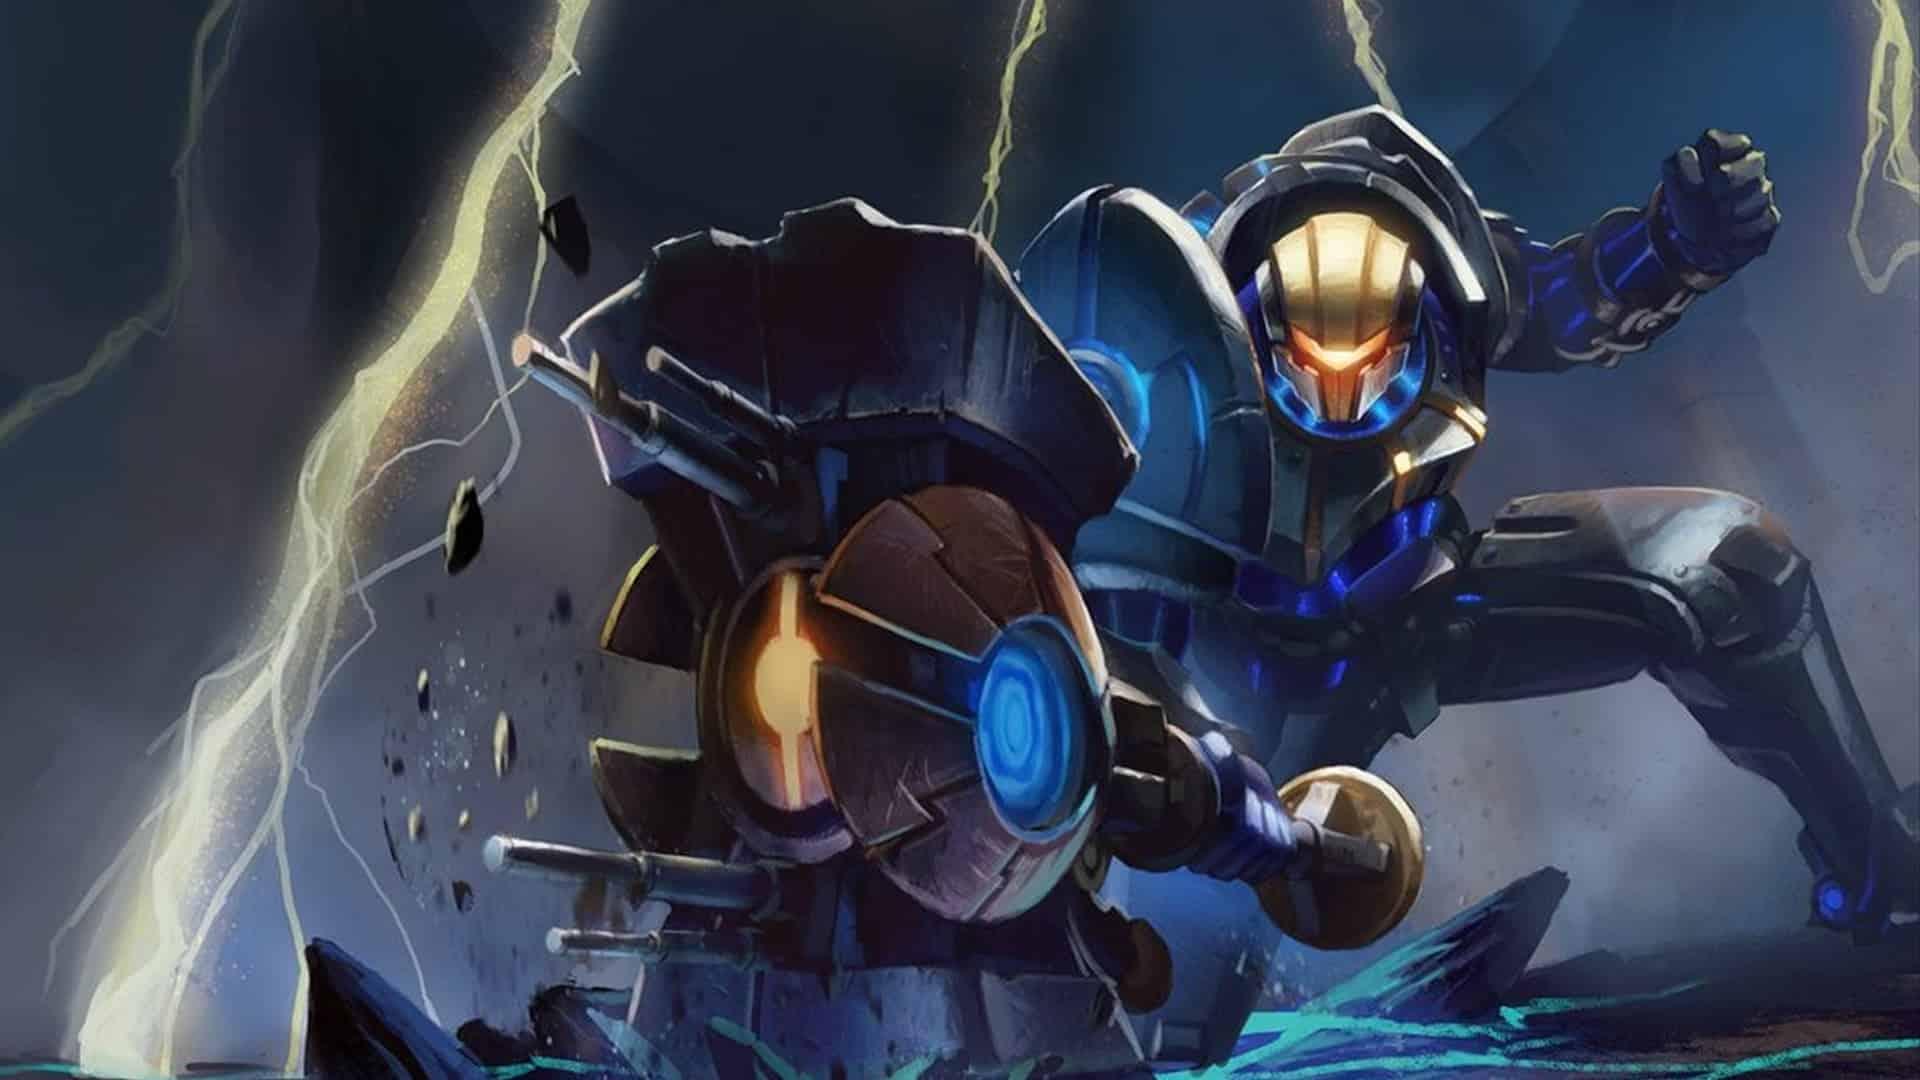 Official League of Legends art from Jayce